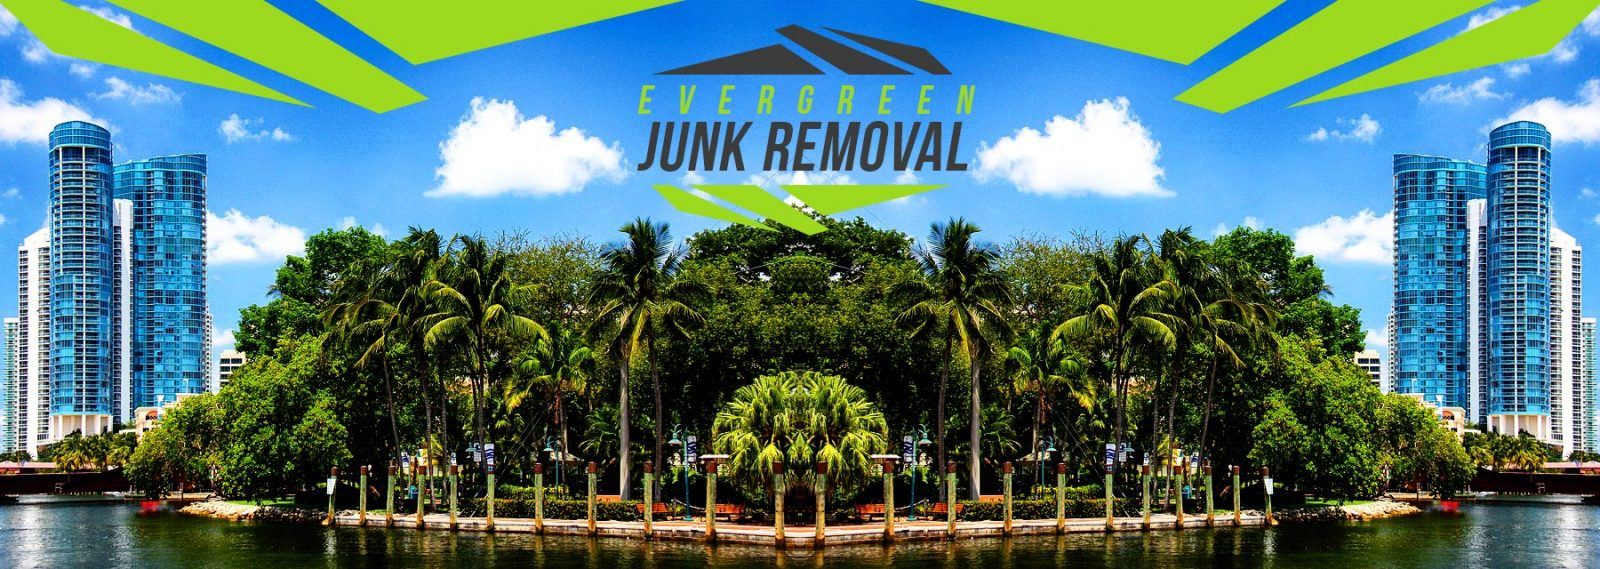 Boca Raton Hot Tub Removal Company